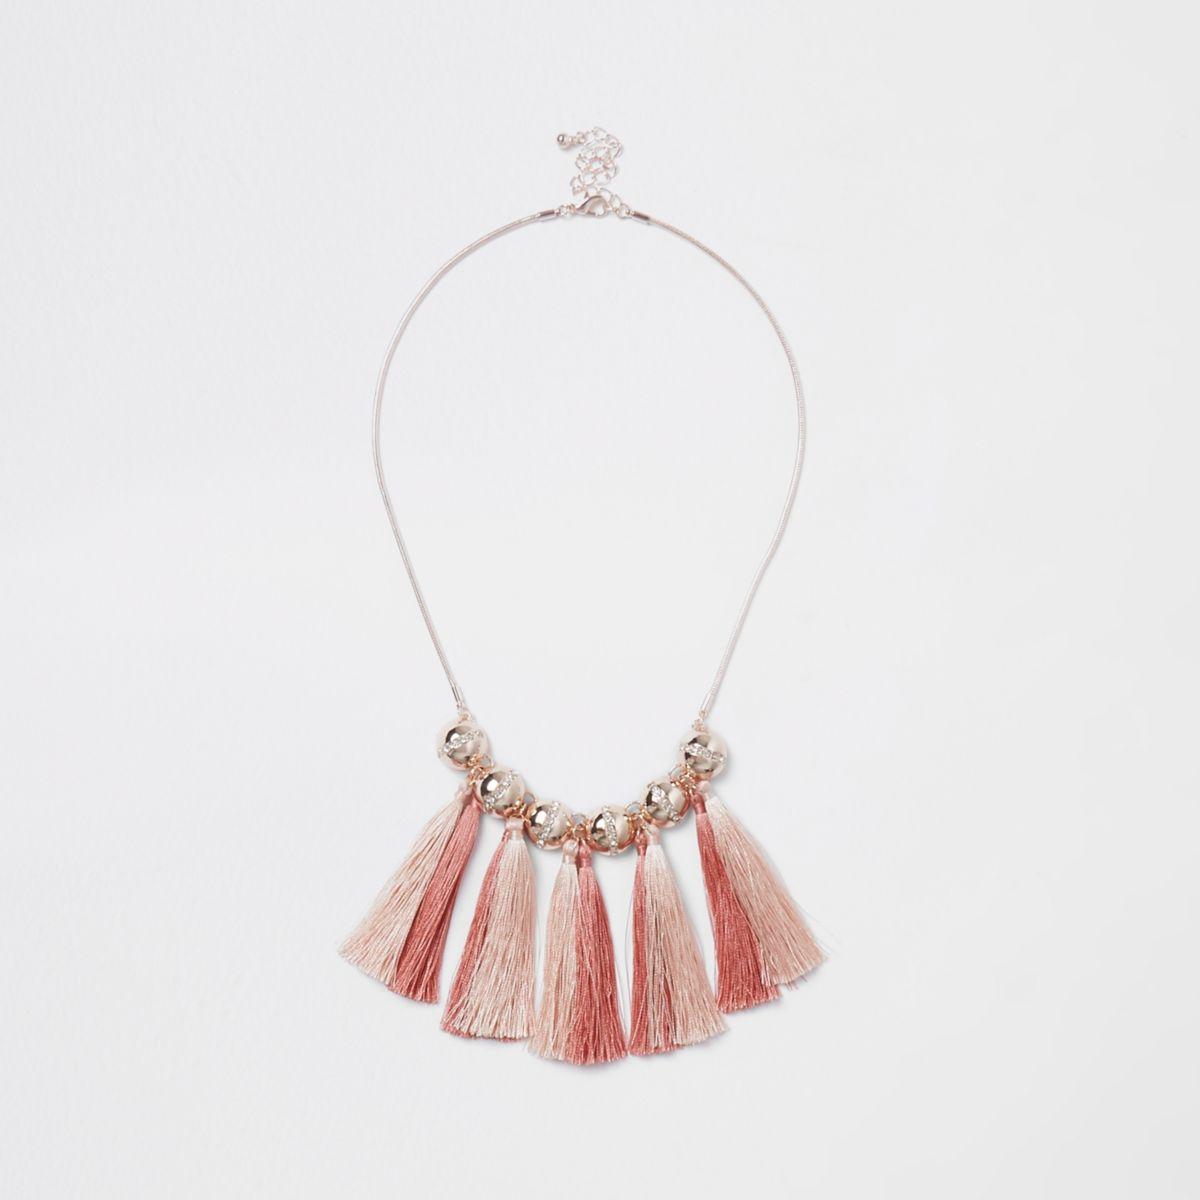 Goudkleurige ketting met roze kwastjes en stras